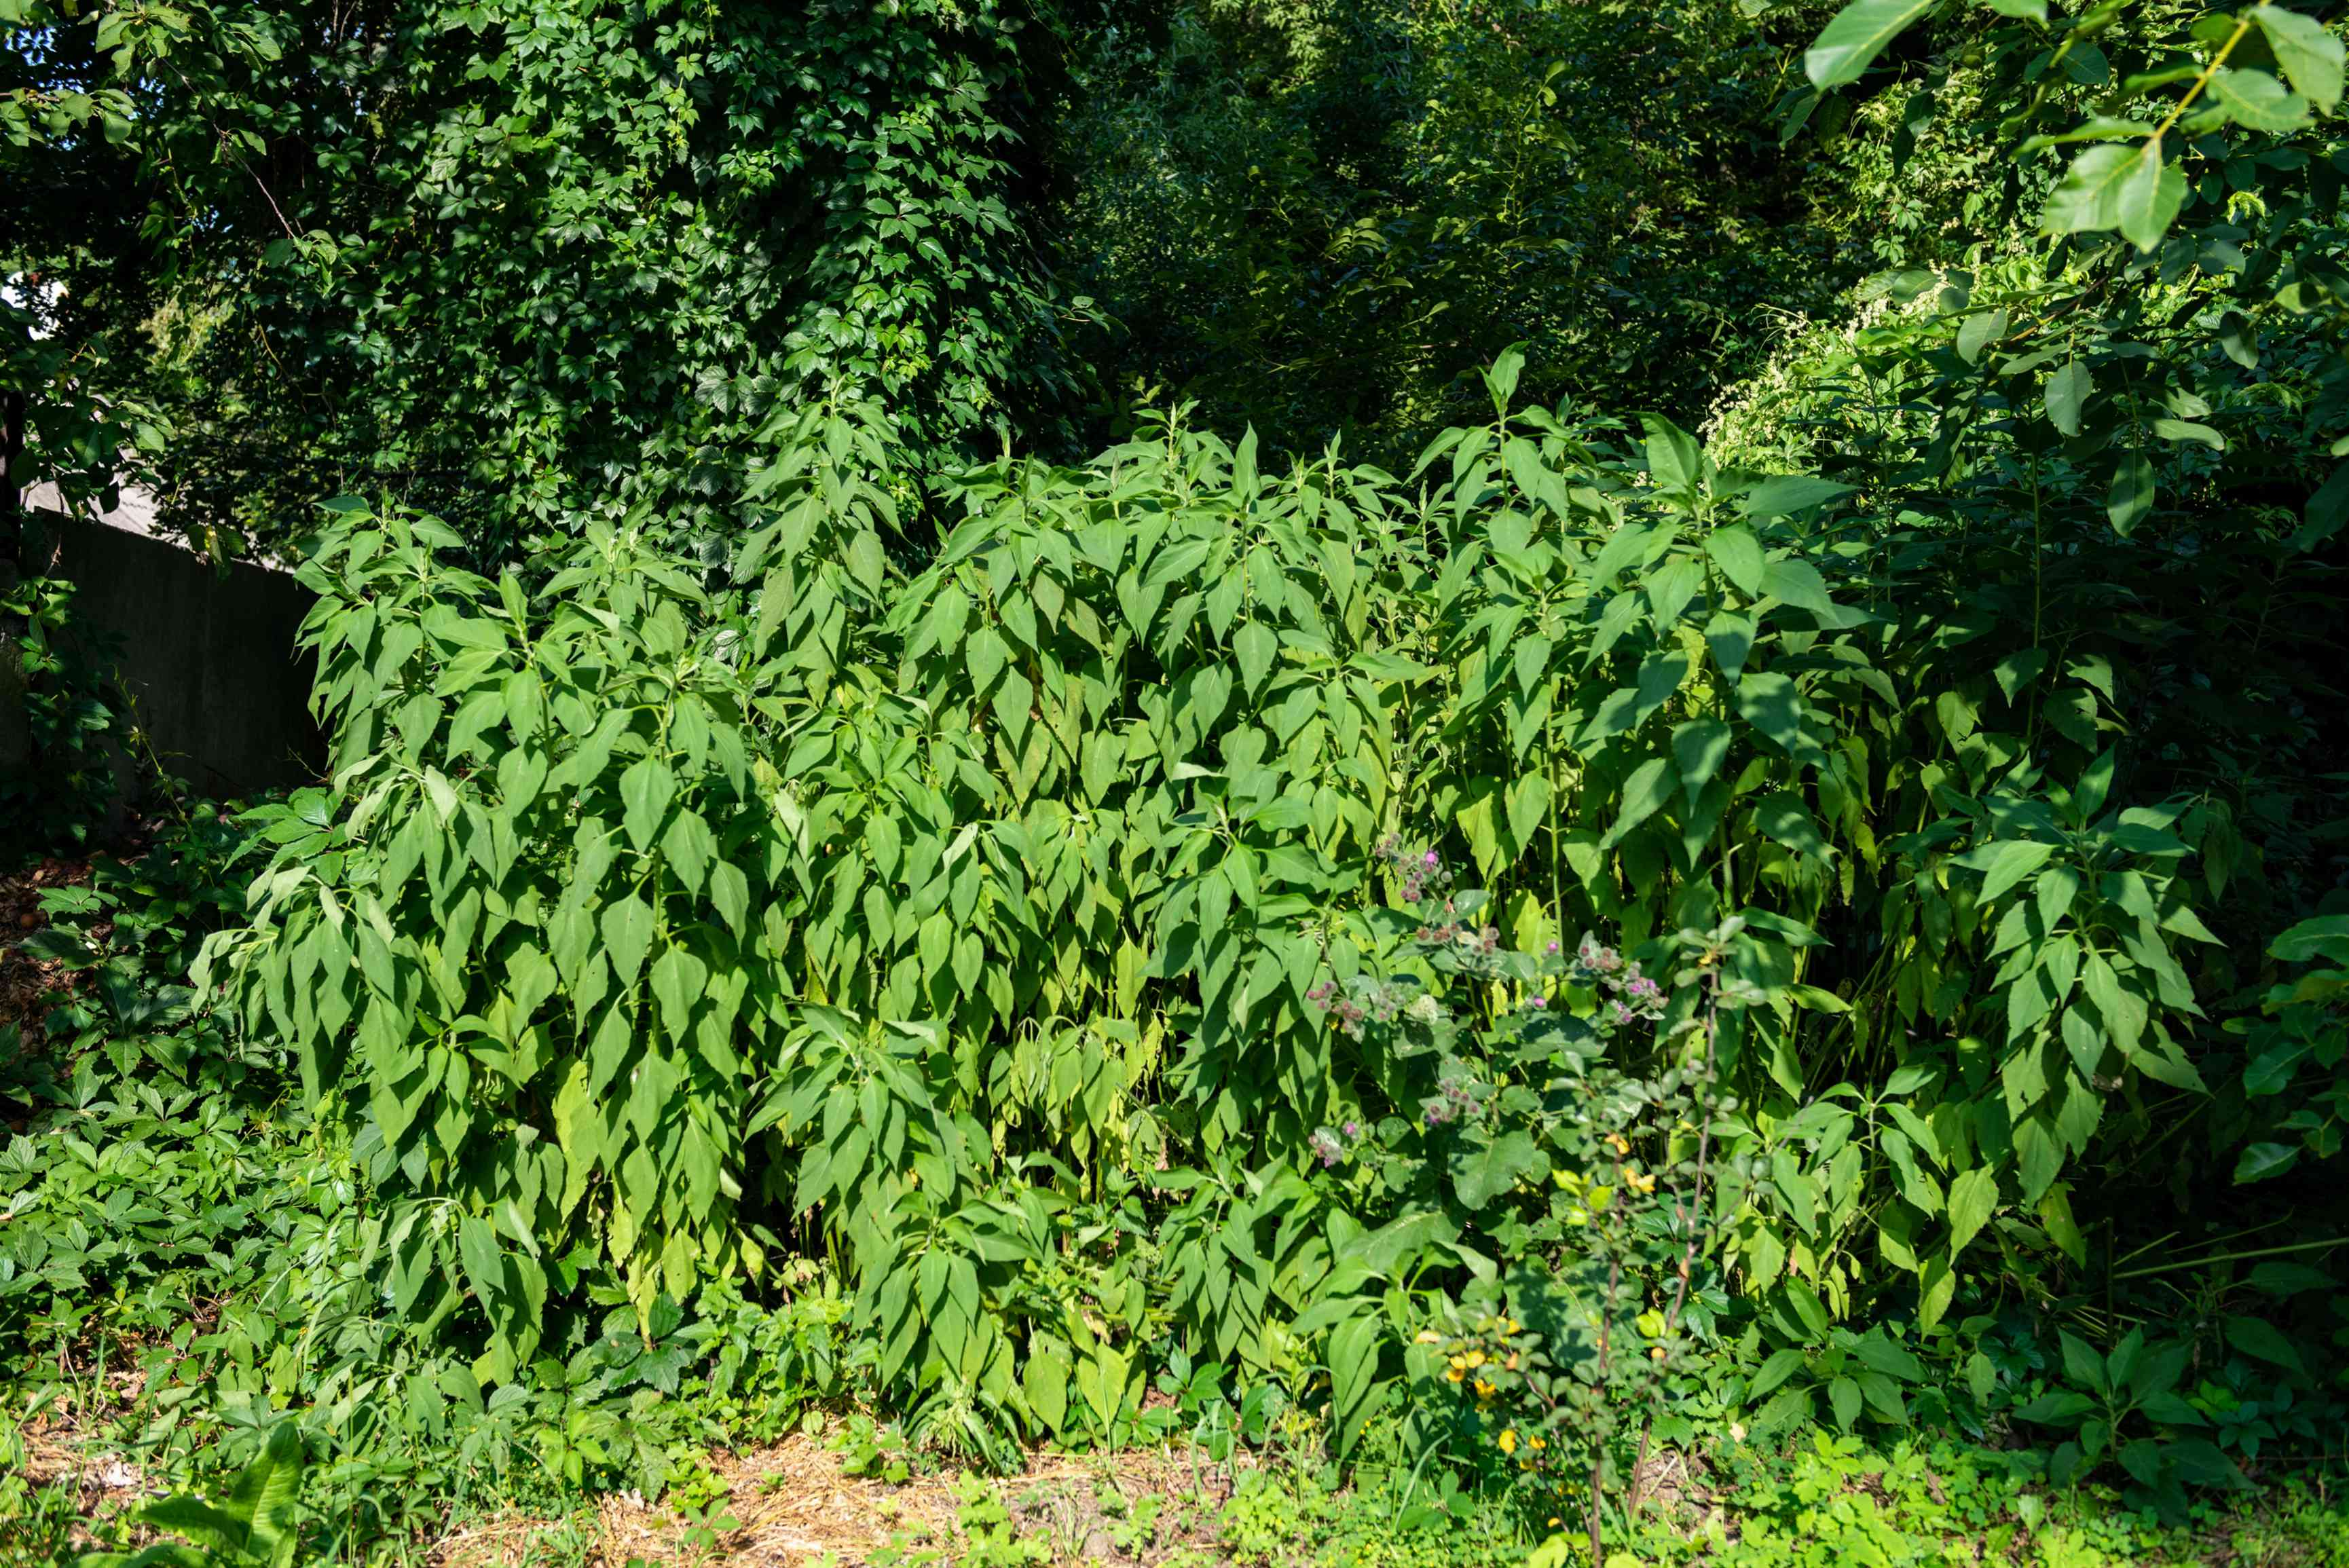 Jerusalem artichoke plant growing on tall stems with bright green arrow-shaped leaves in sunlight